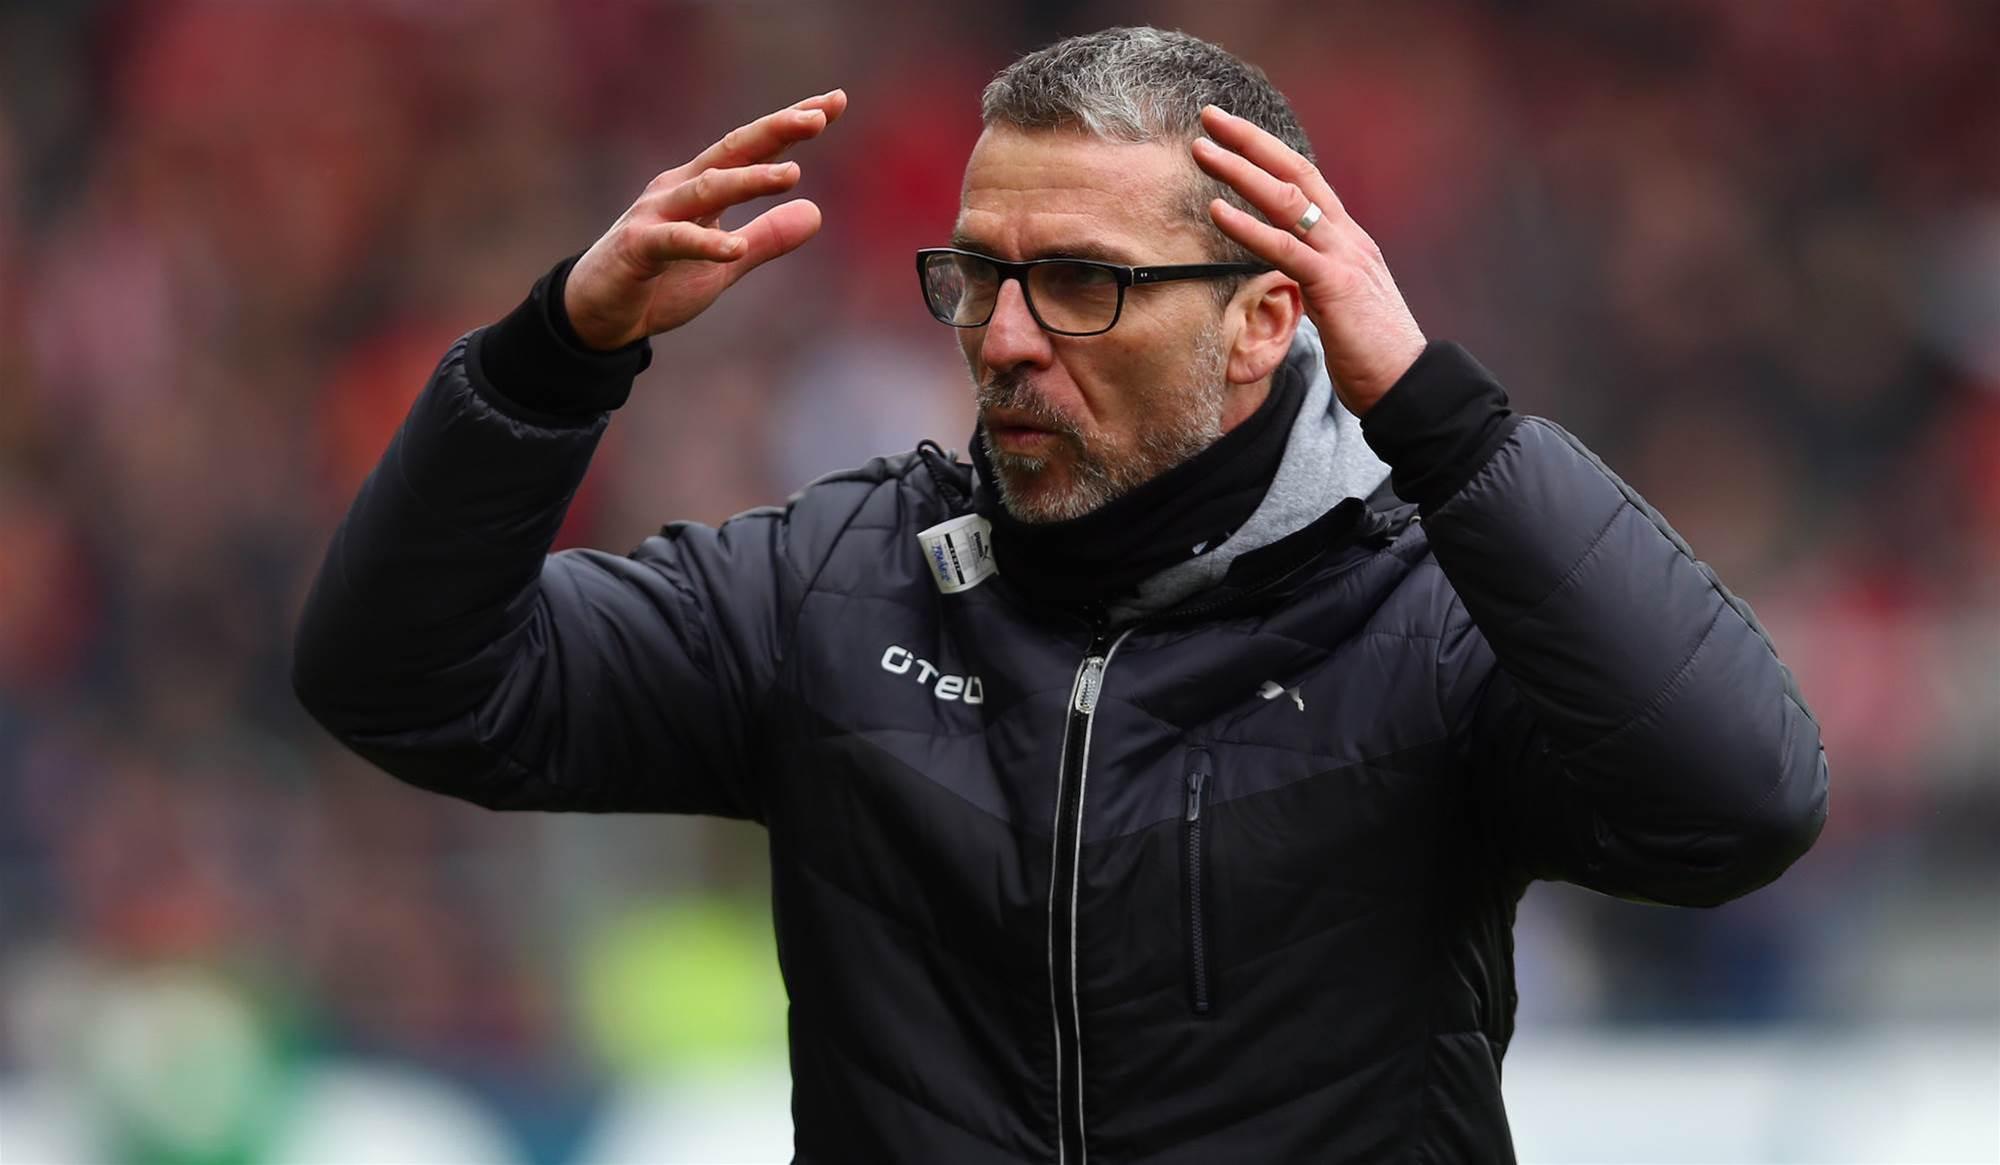 Kurz: We've had a difficult pre-season